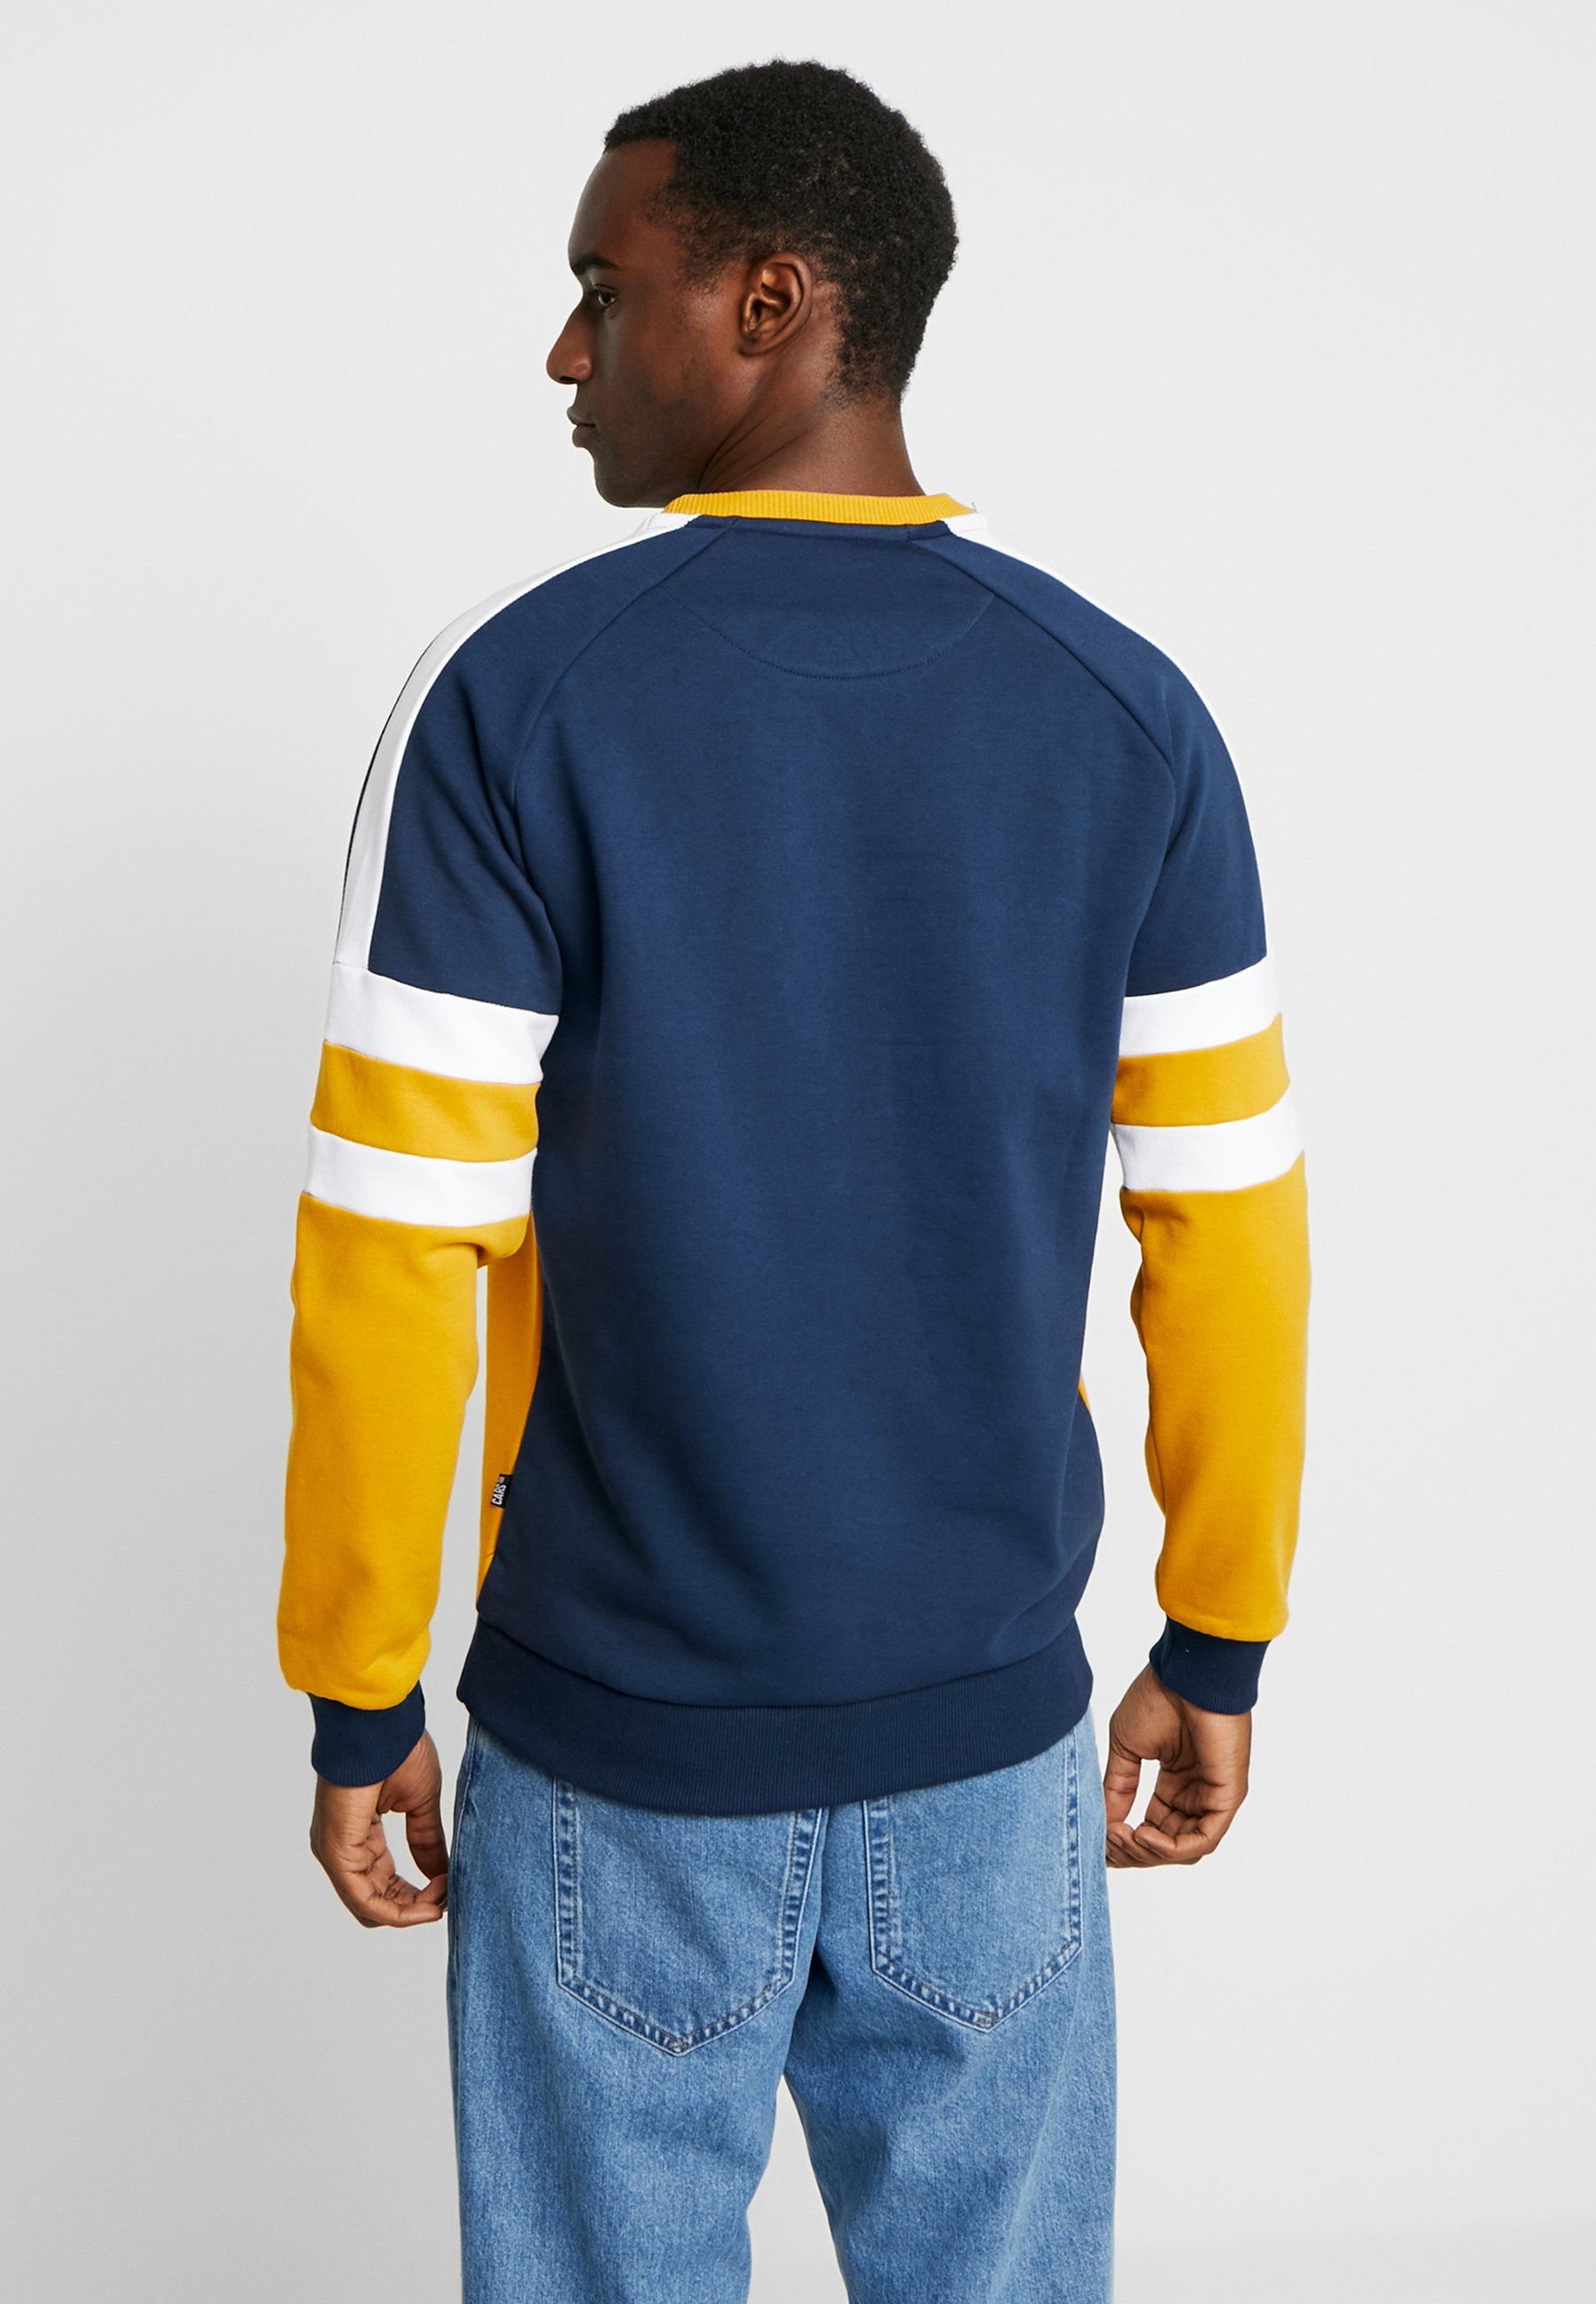 Cars Jeans Navy Cars Jeans HendrixSweatshirt Navy HendrixSweatshirt Cars HendrixSweatshirt Jeans iuTOkPXZ